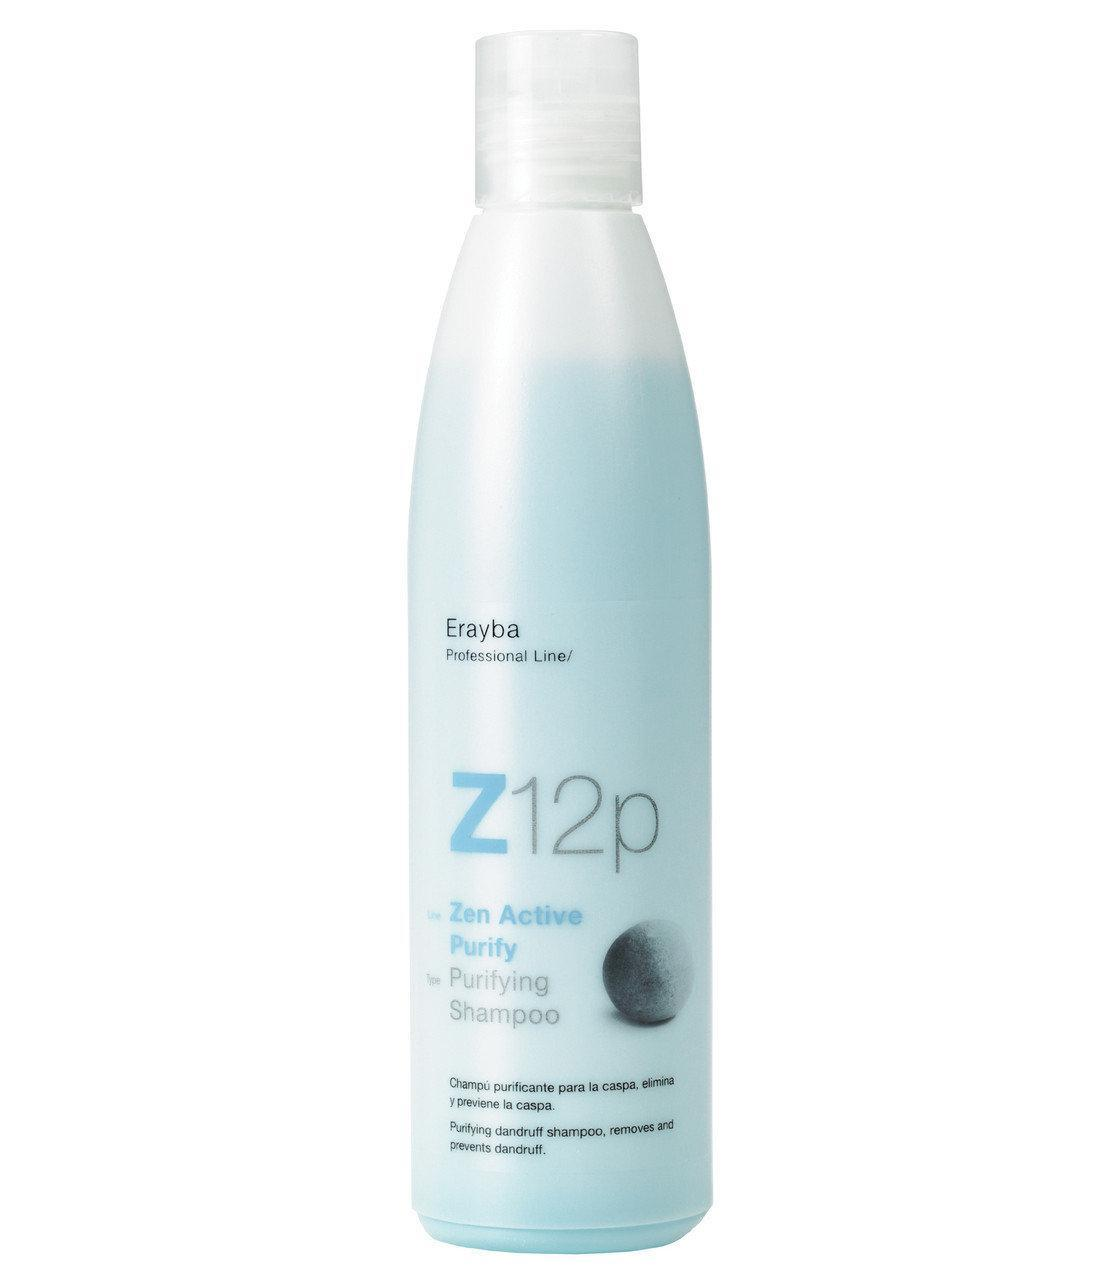 Шампунь против перхоти Erayba Z12p Purifying Shampoo (разлив) 150 гр